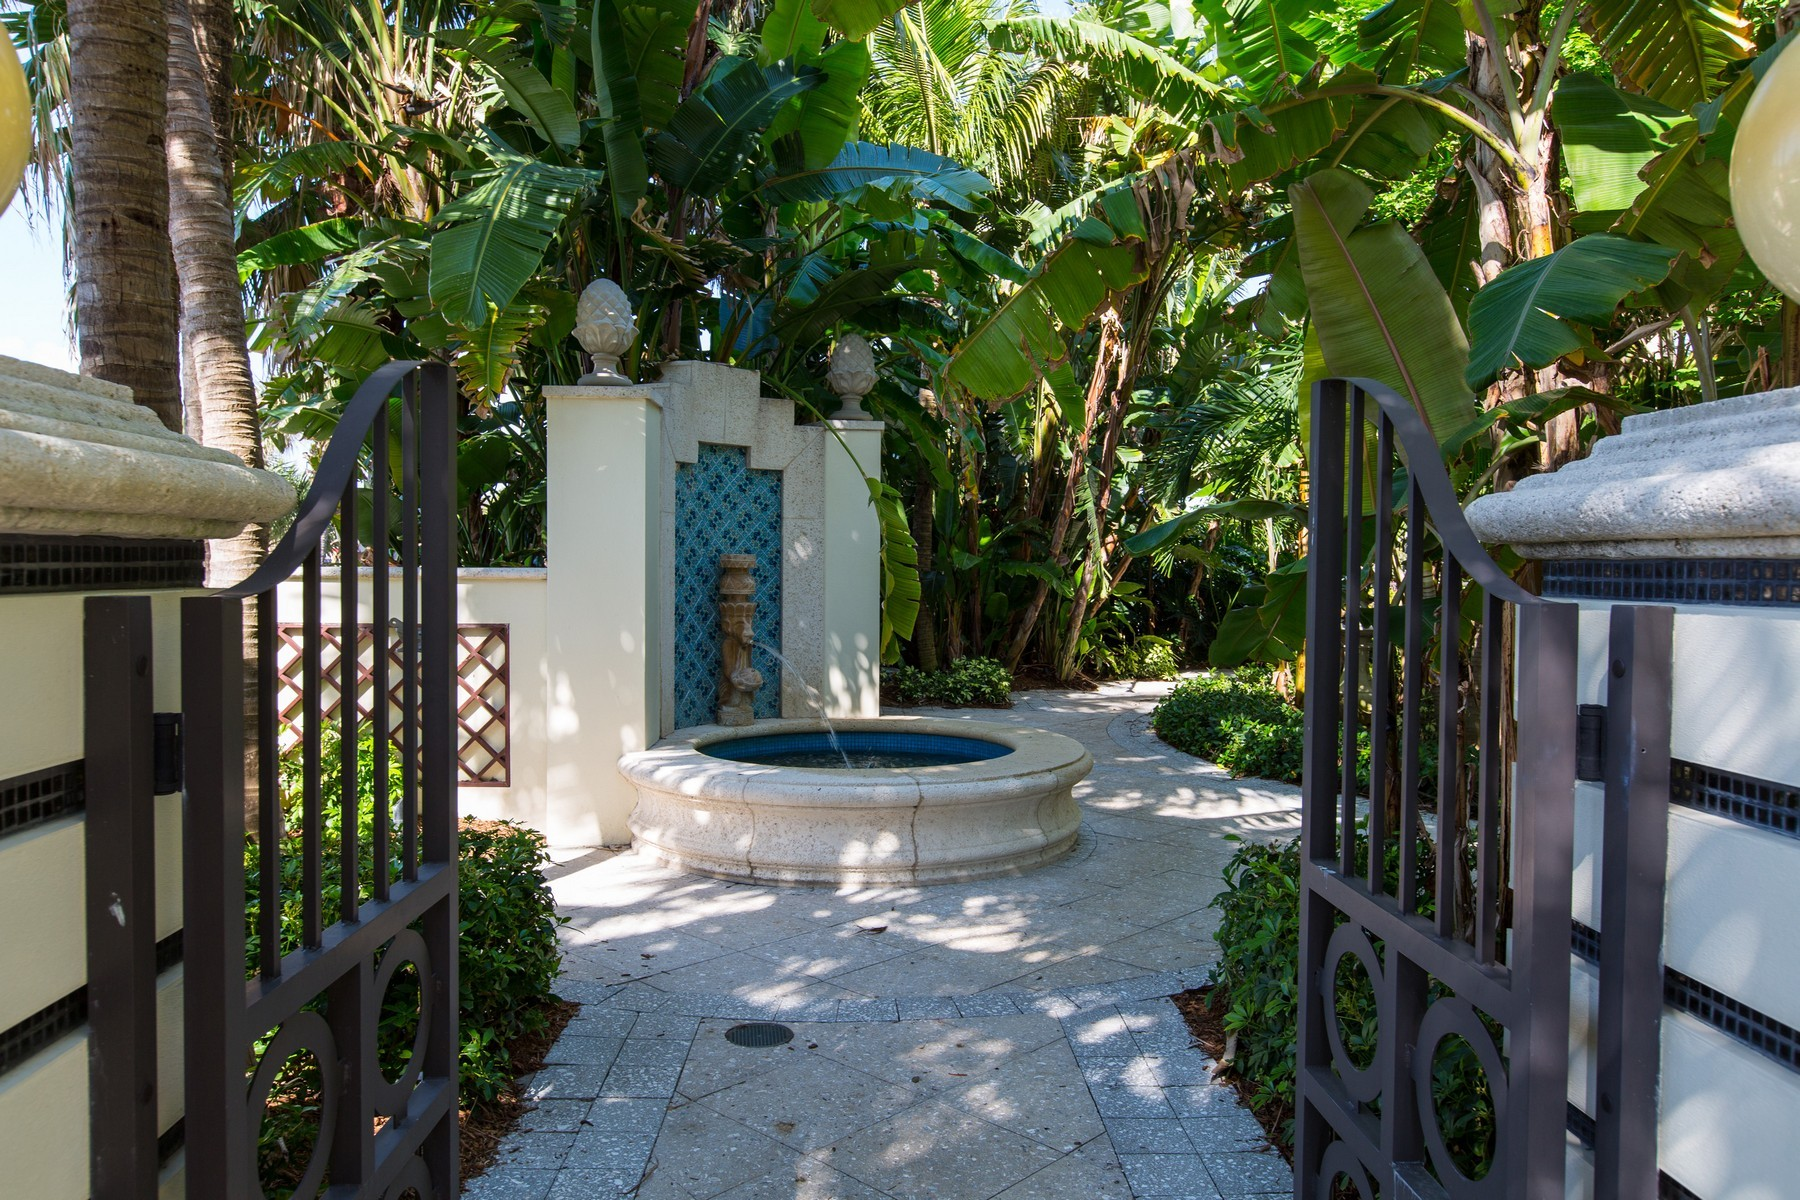 Additional photo for property listing at Vero Beach Condo Hotel 3500 Ocean Drive #407 Vero Beach, Florida 32963 United States